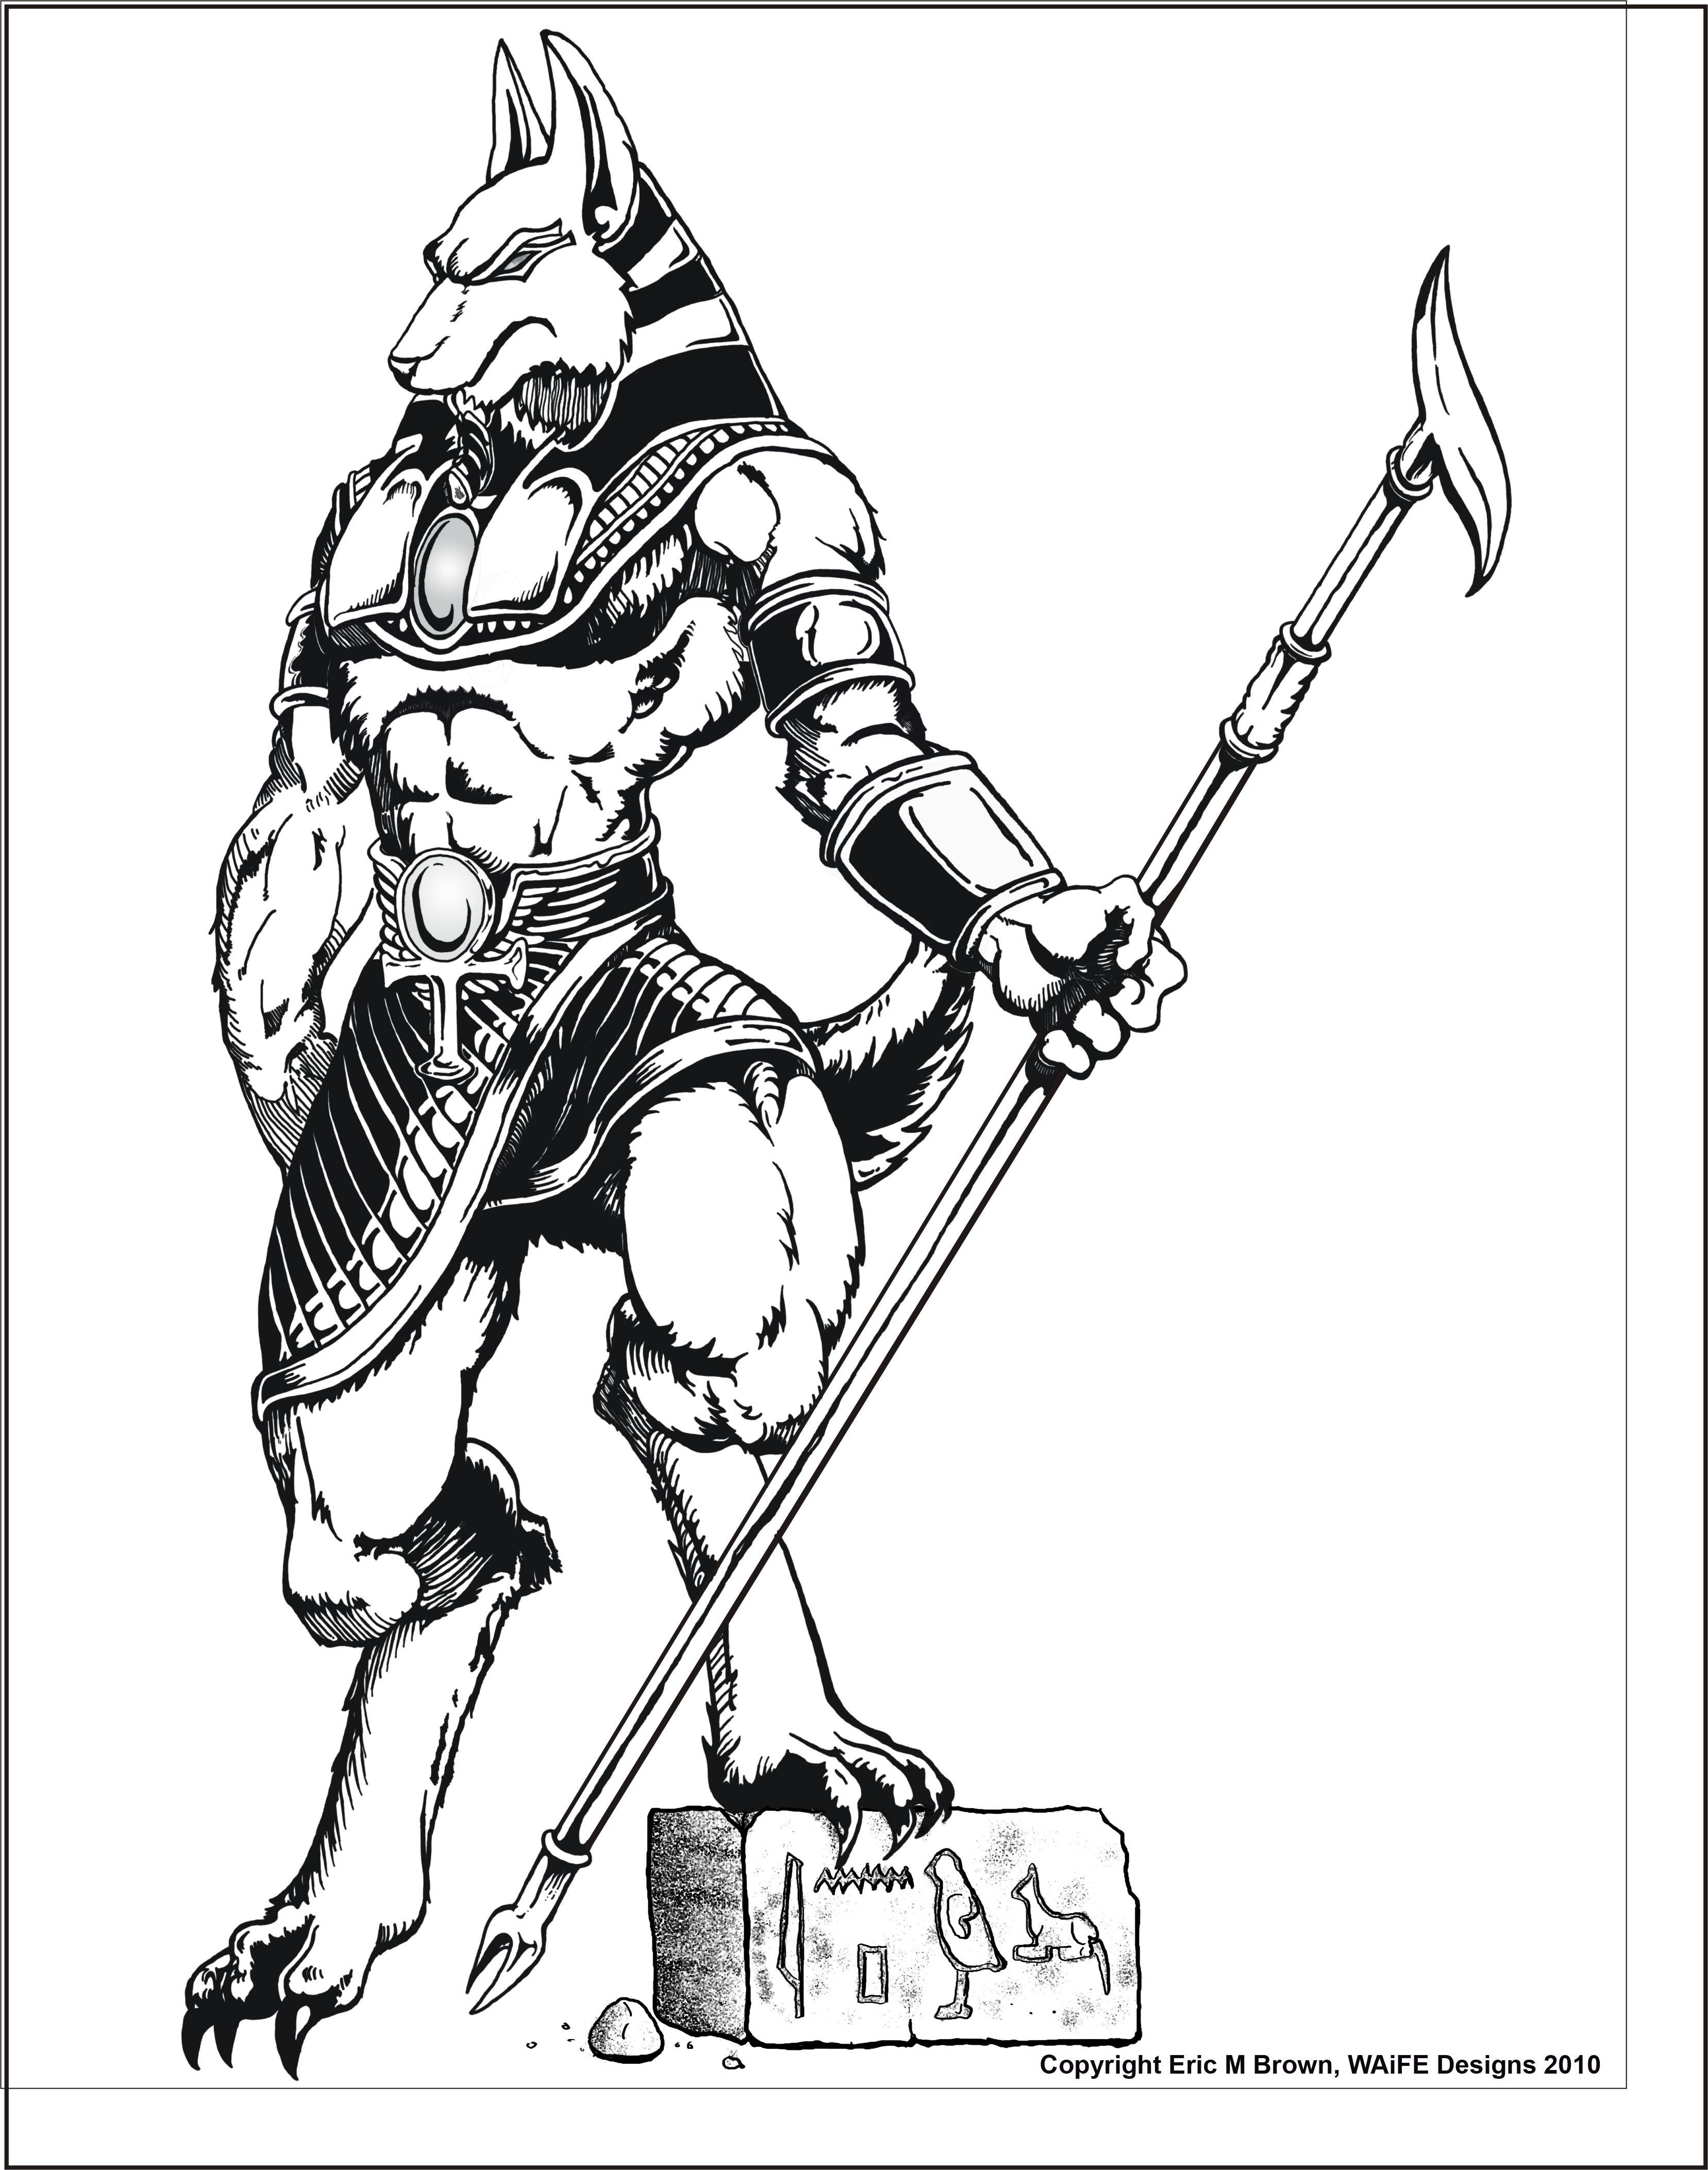 anubis drawing at getdrawings com